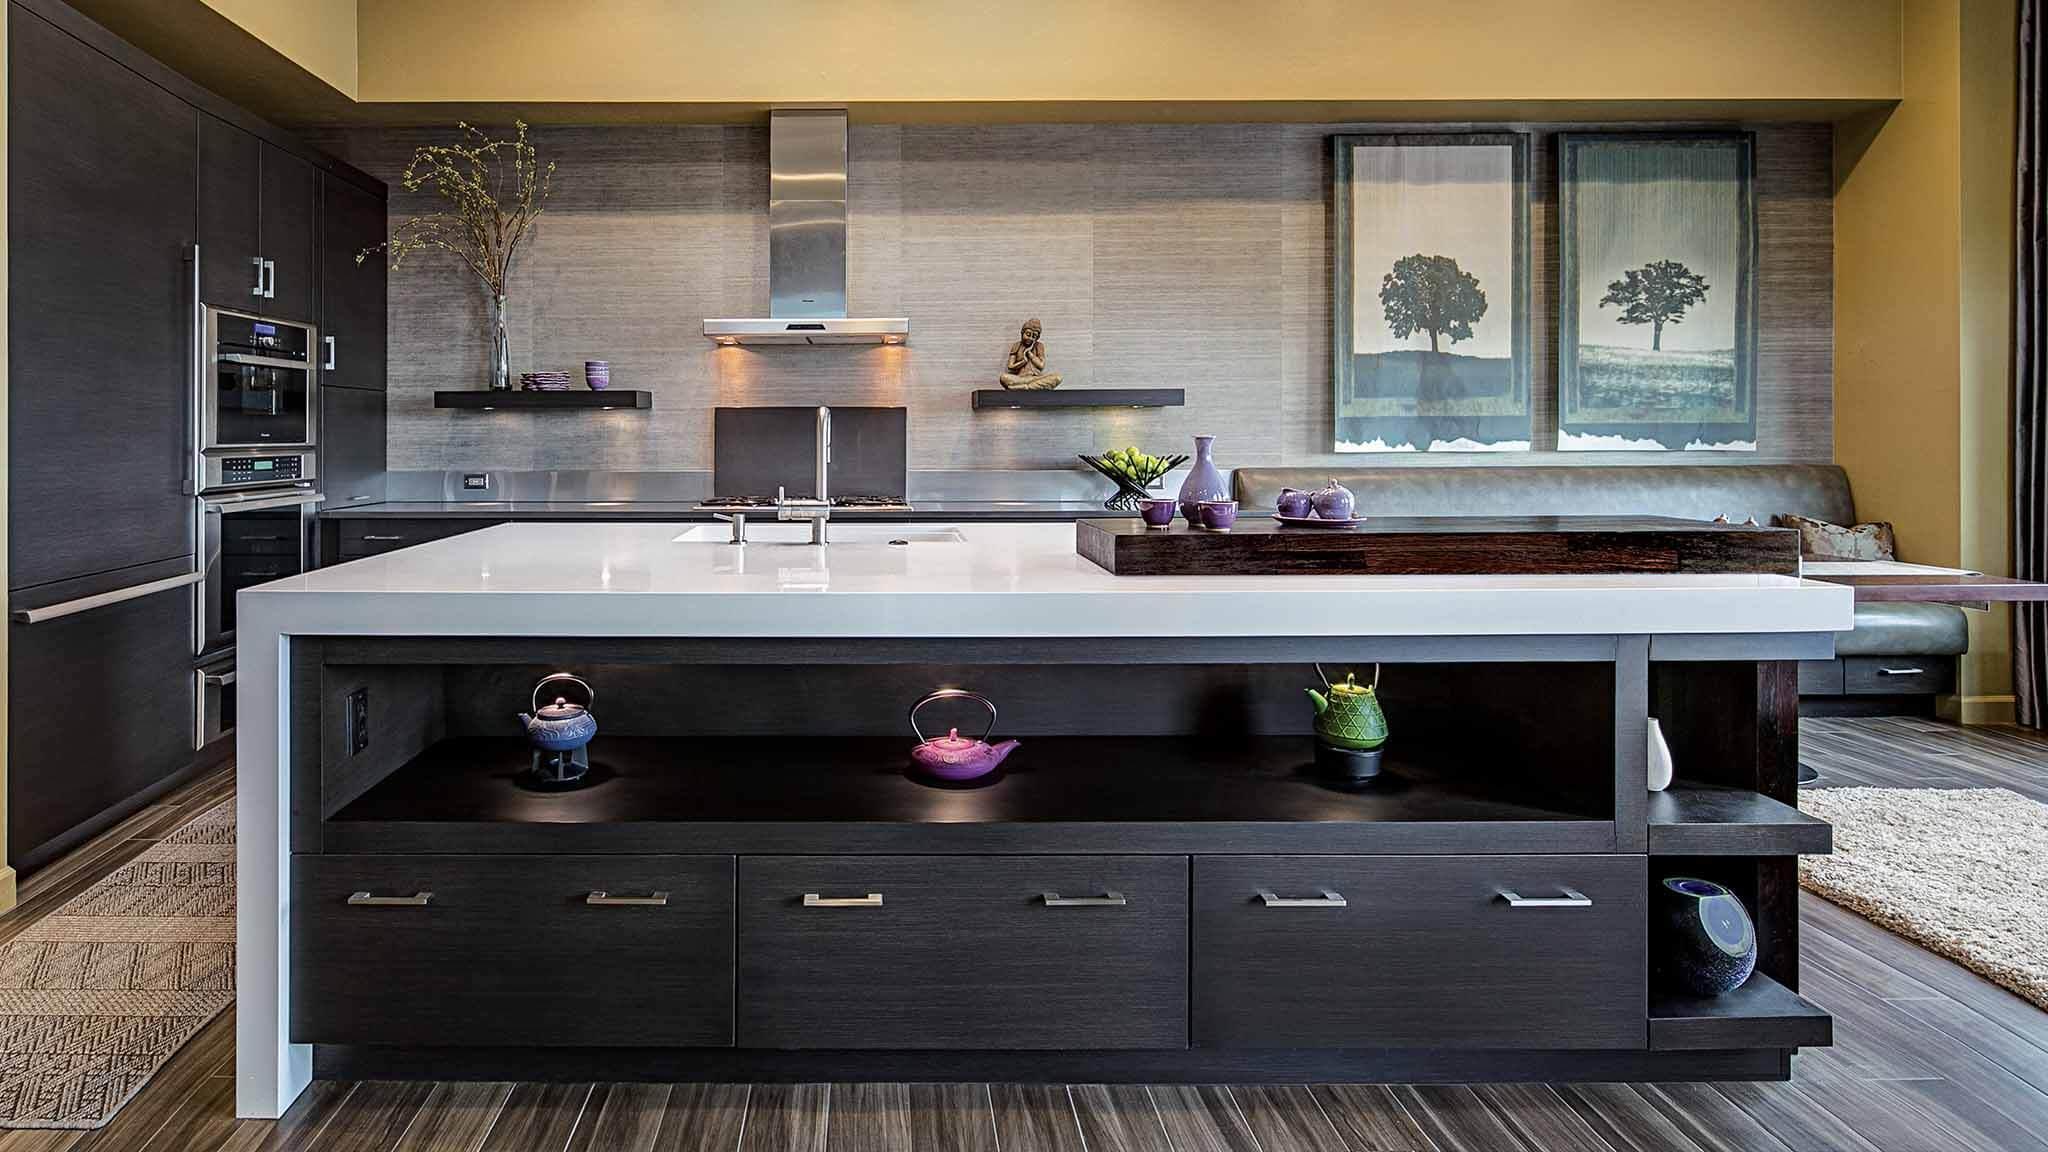 Cabinetry Award Winning Kitchen & Bath Design Studio